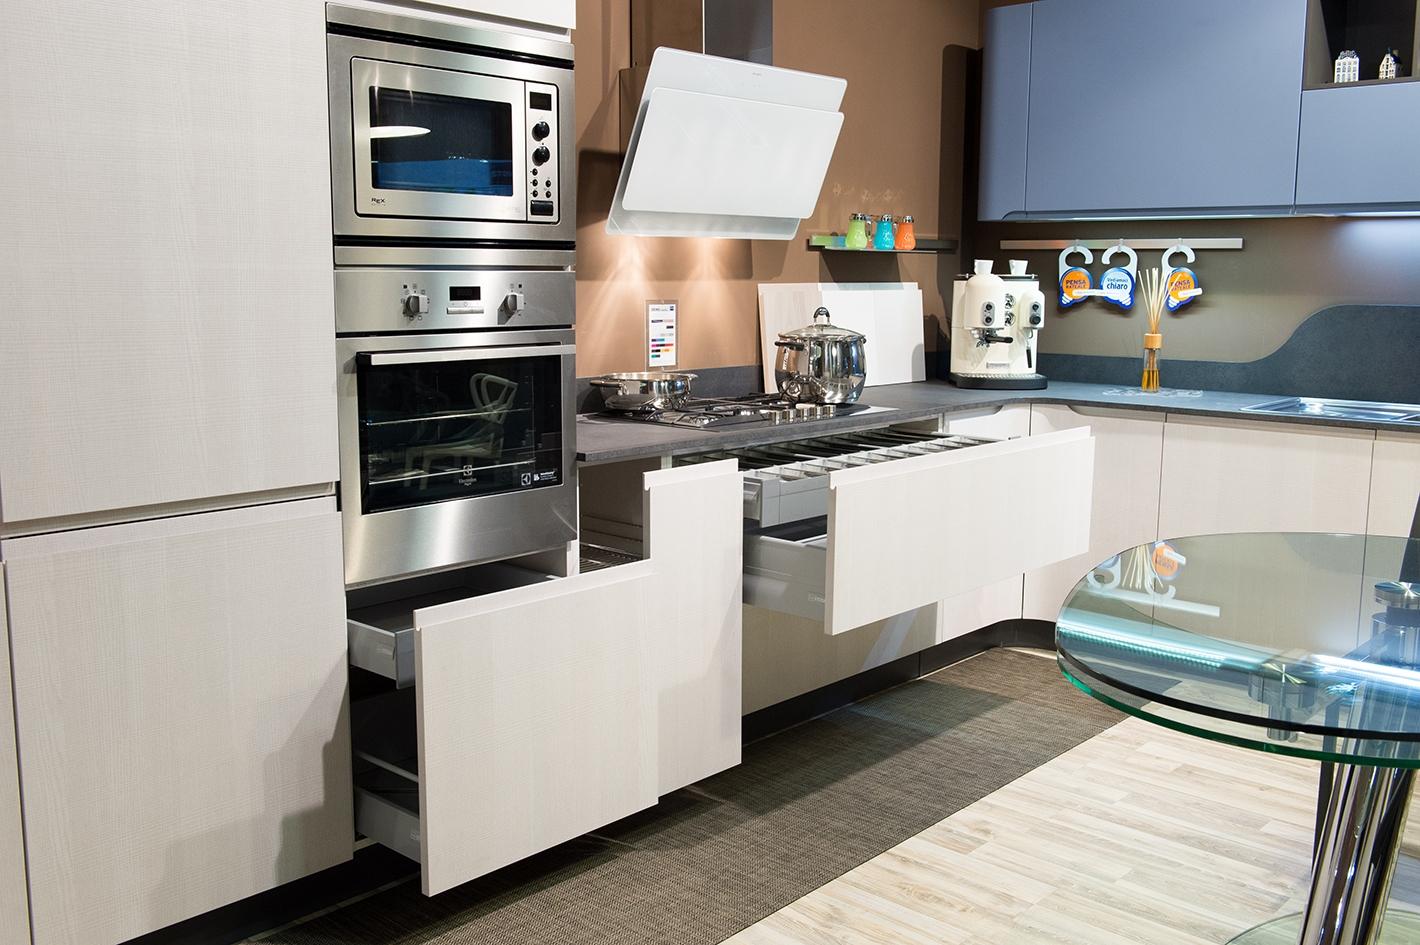 Cucina stosa bring completa di elettrodomestici 20983 cucine a prezzi scontati - Cucina completa prezzi ...